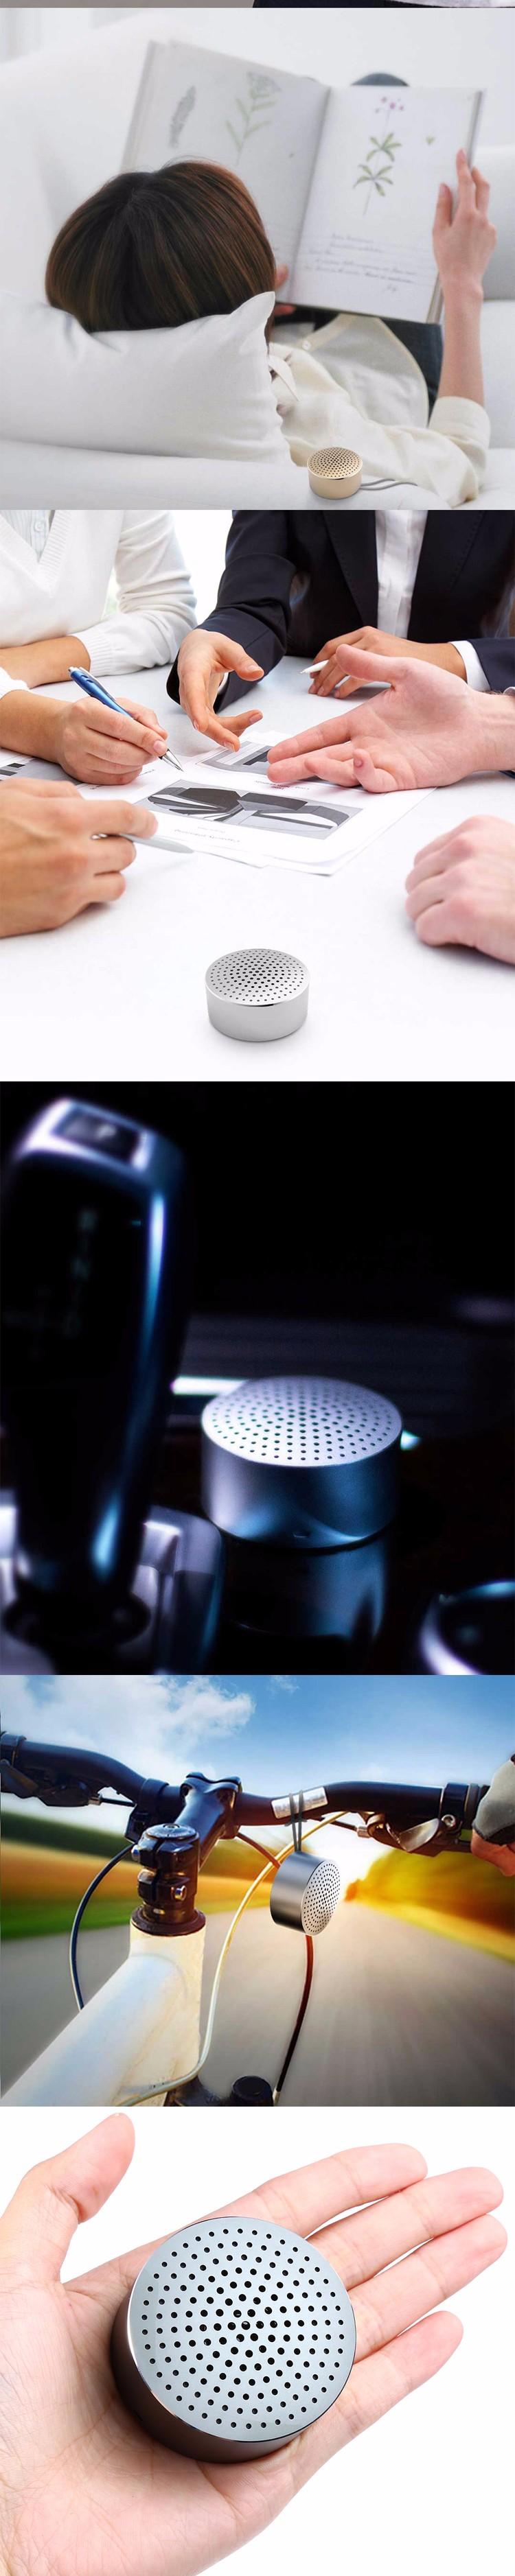 Mi Speaker Metal Steel Hands Free Speaker